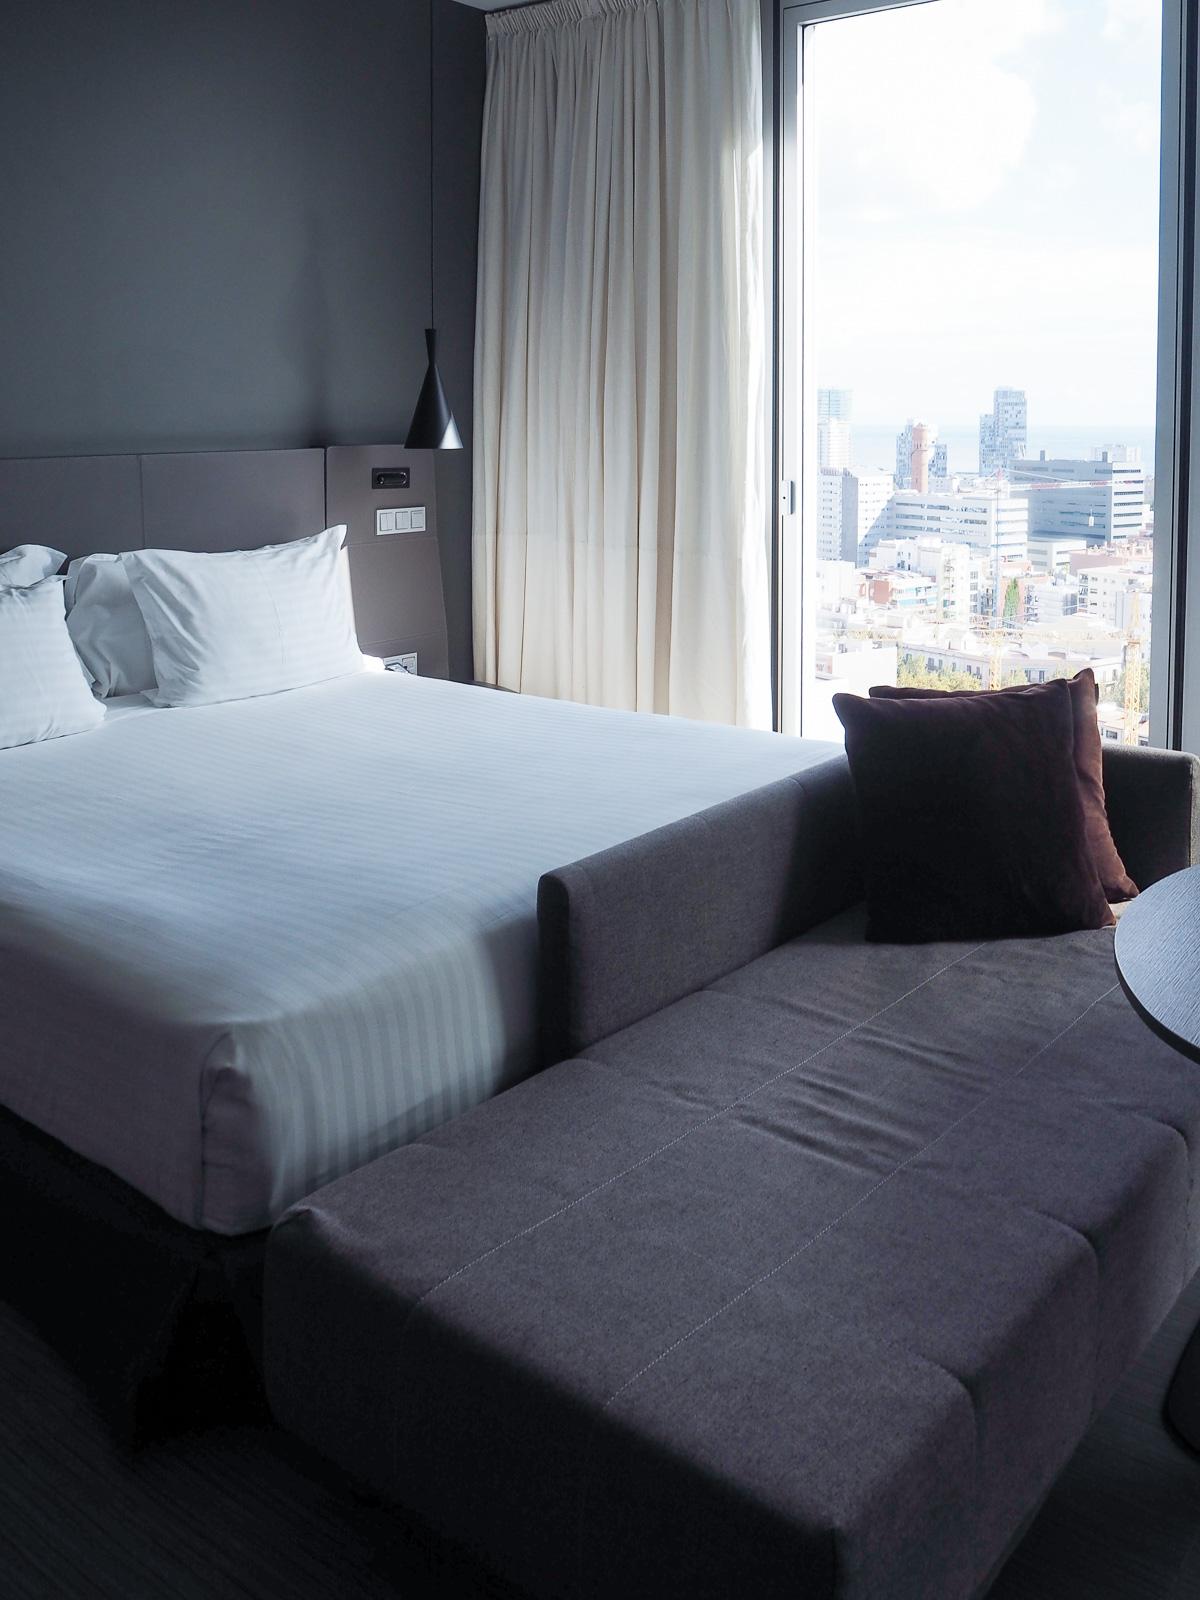 Melia, Melia Barcelona Sky, Barcelona Hotel, Hotel Bedroom, Hotel, Barcelona,